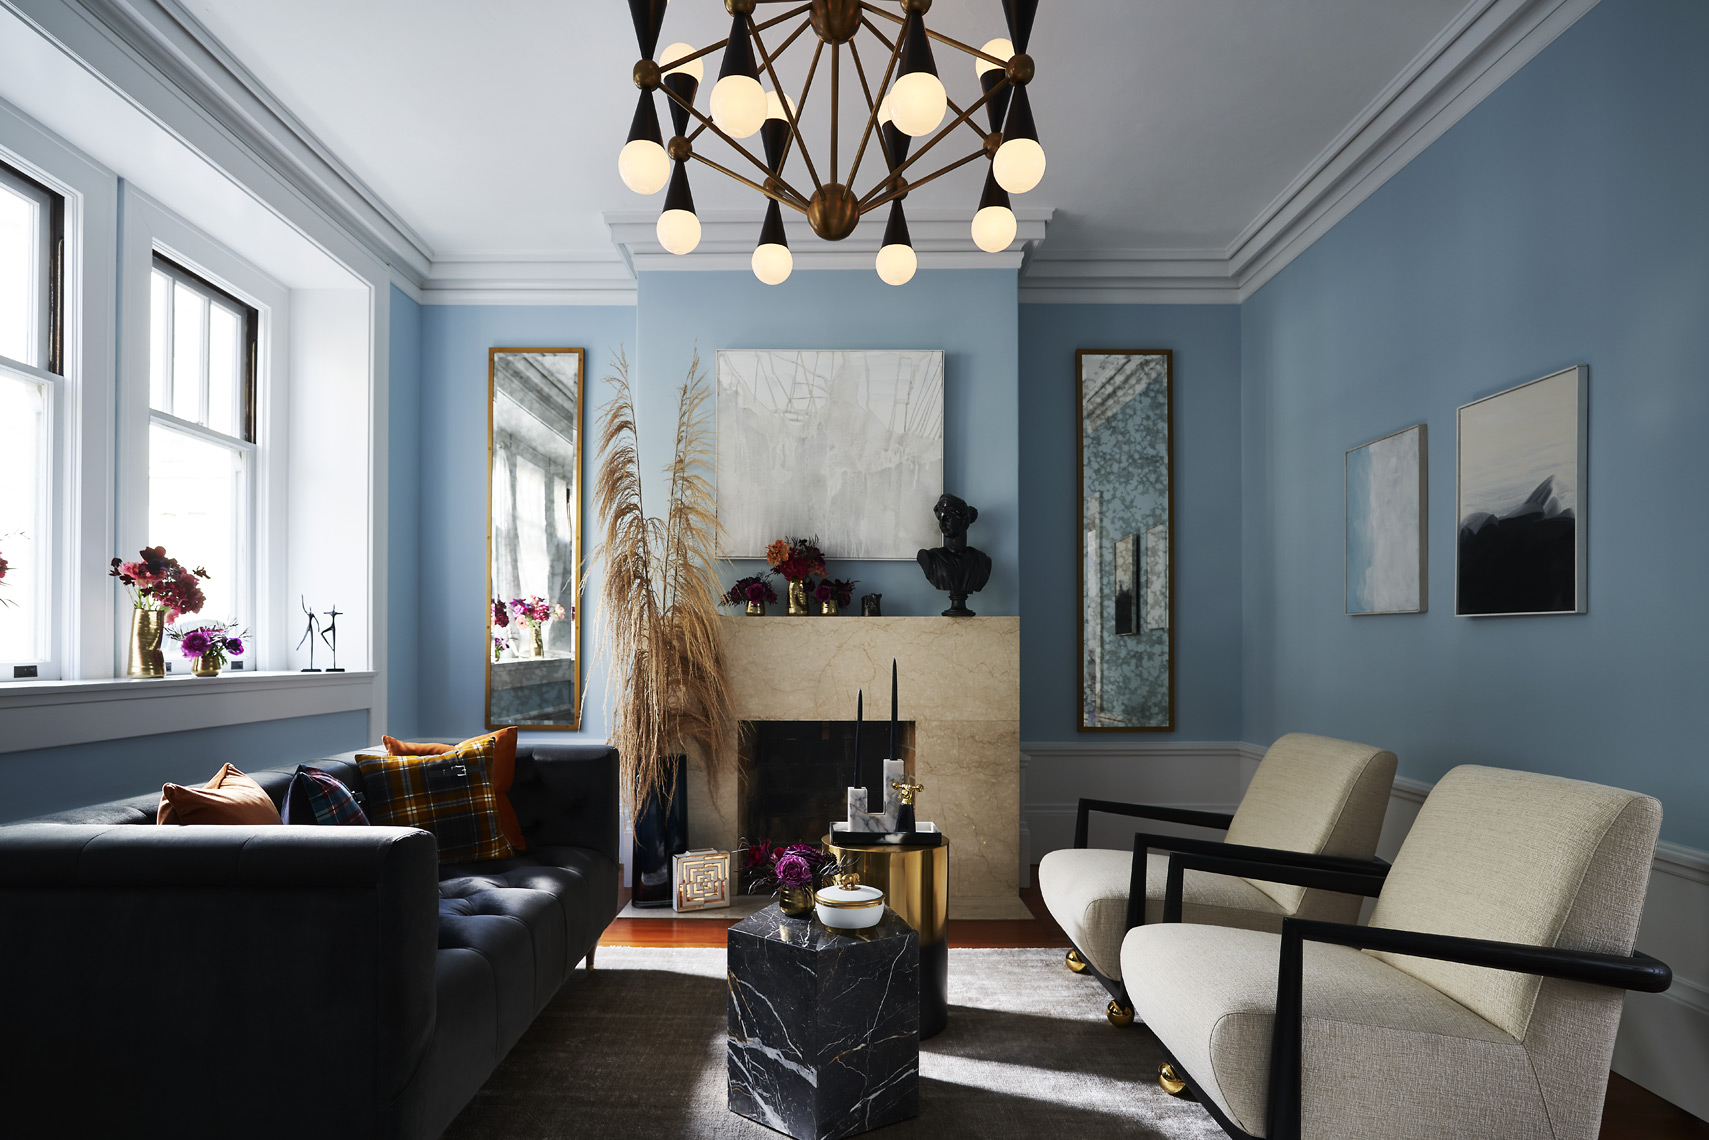 rterior-studio-los-angeles-ca-edwardian-beauty-view-of-edwardian-inspired-office-light-blue-walls